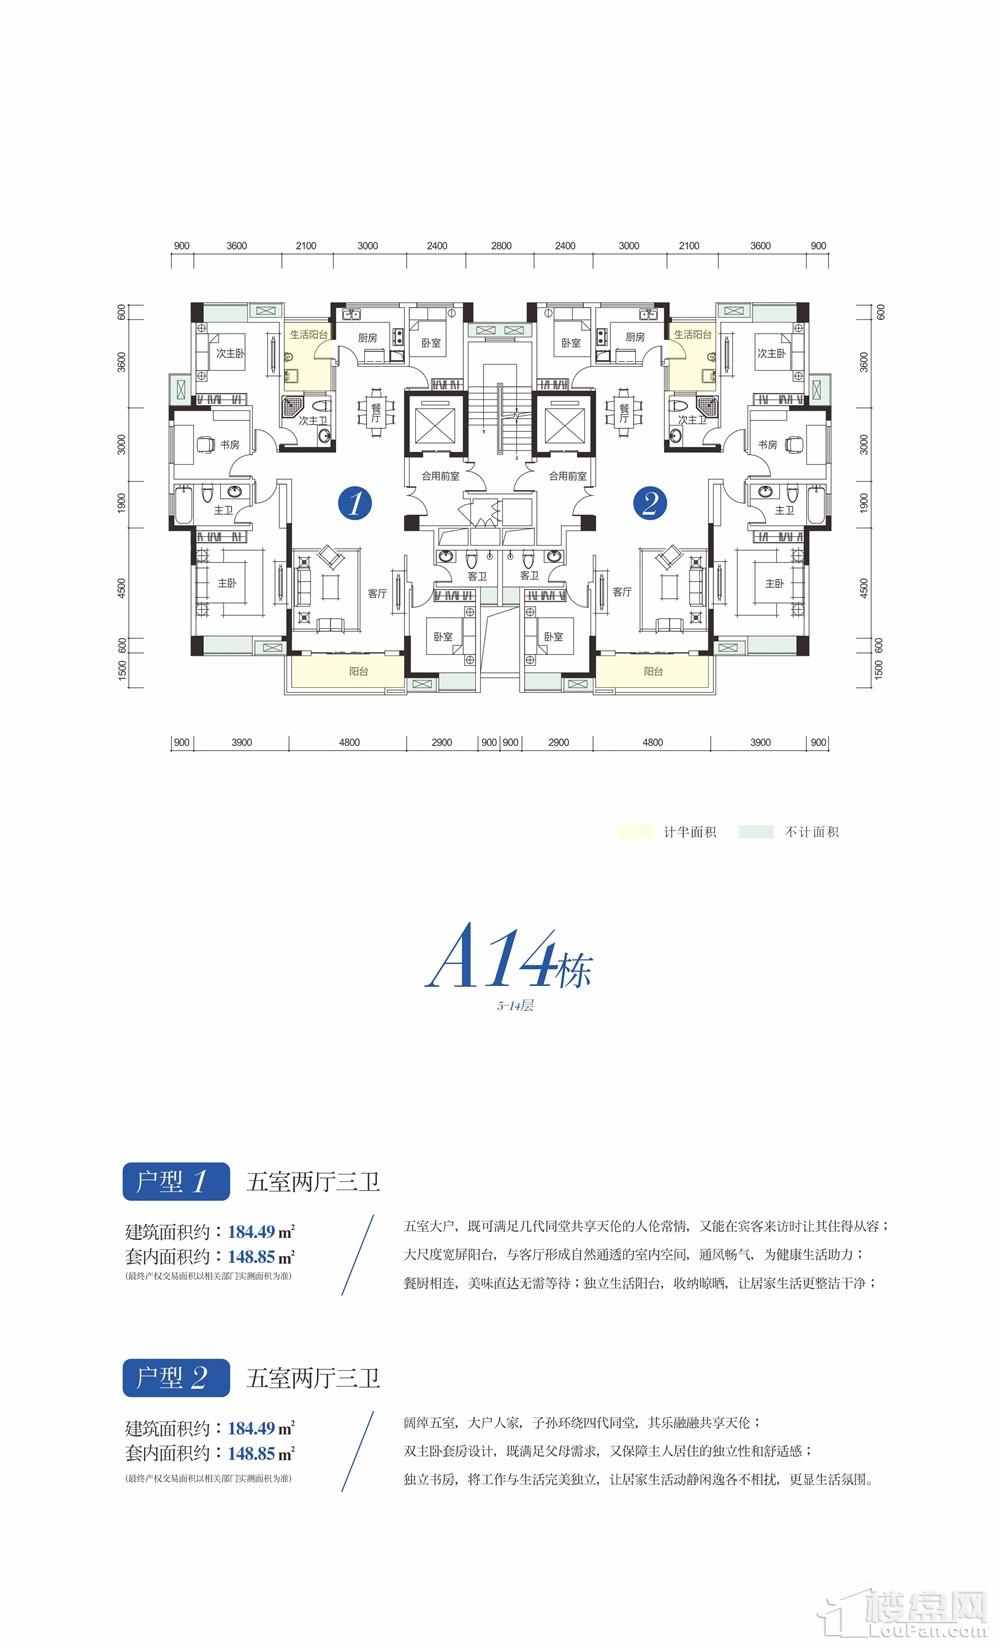 A14栋5-14层